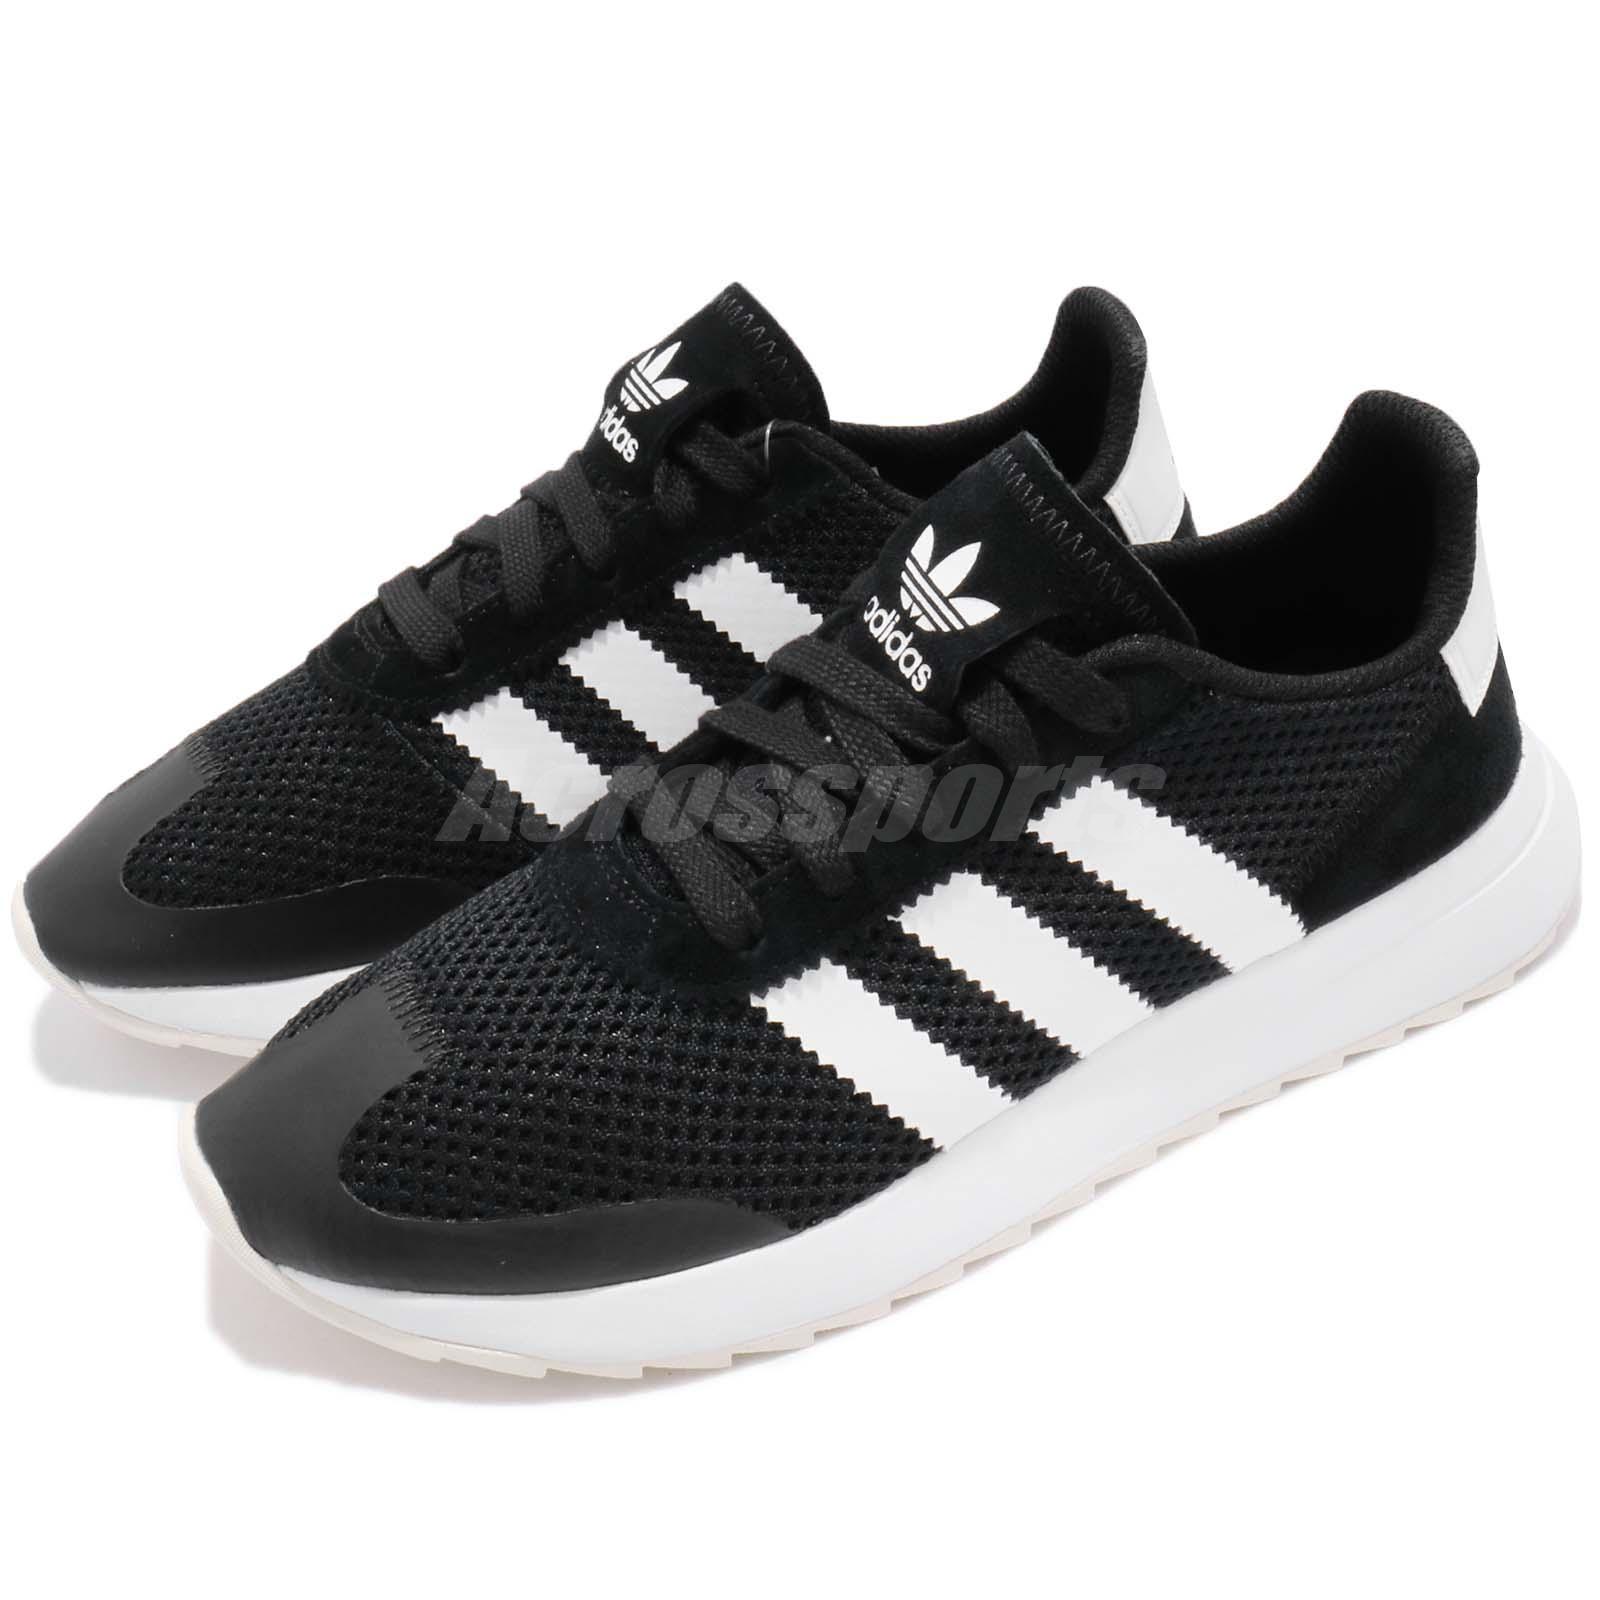 best loved 9d325 a877c adidas Originals FLB W Flashback Black White Women Shoes Sne